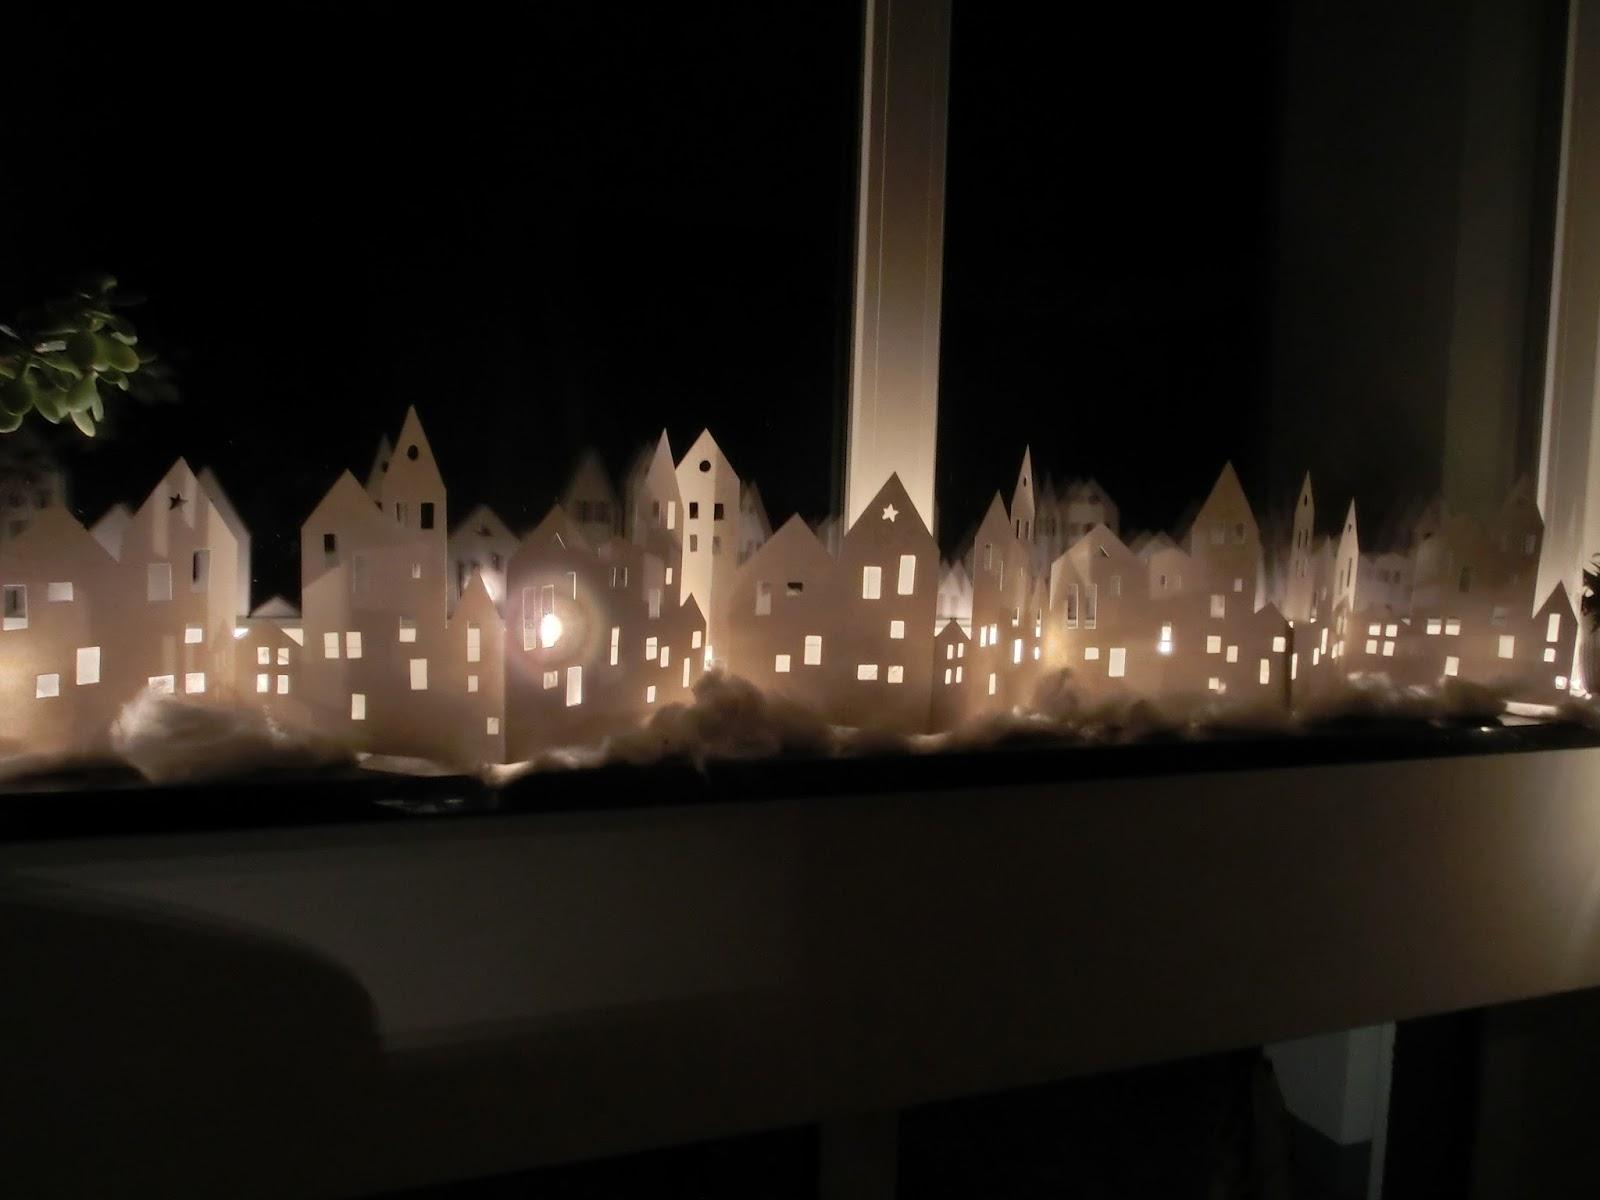 hobby kreativ welt meine beleuchtete stadt auf der. Black Bedroom Furniture Sets. Home Design Ideas